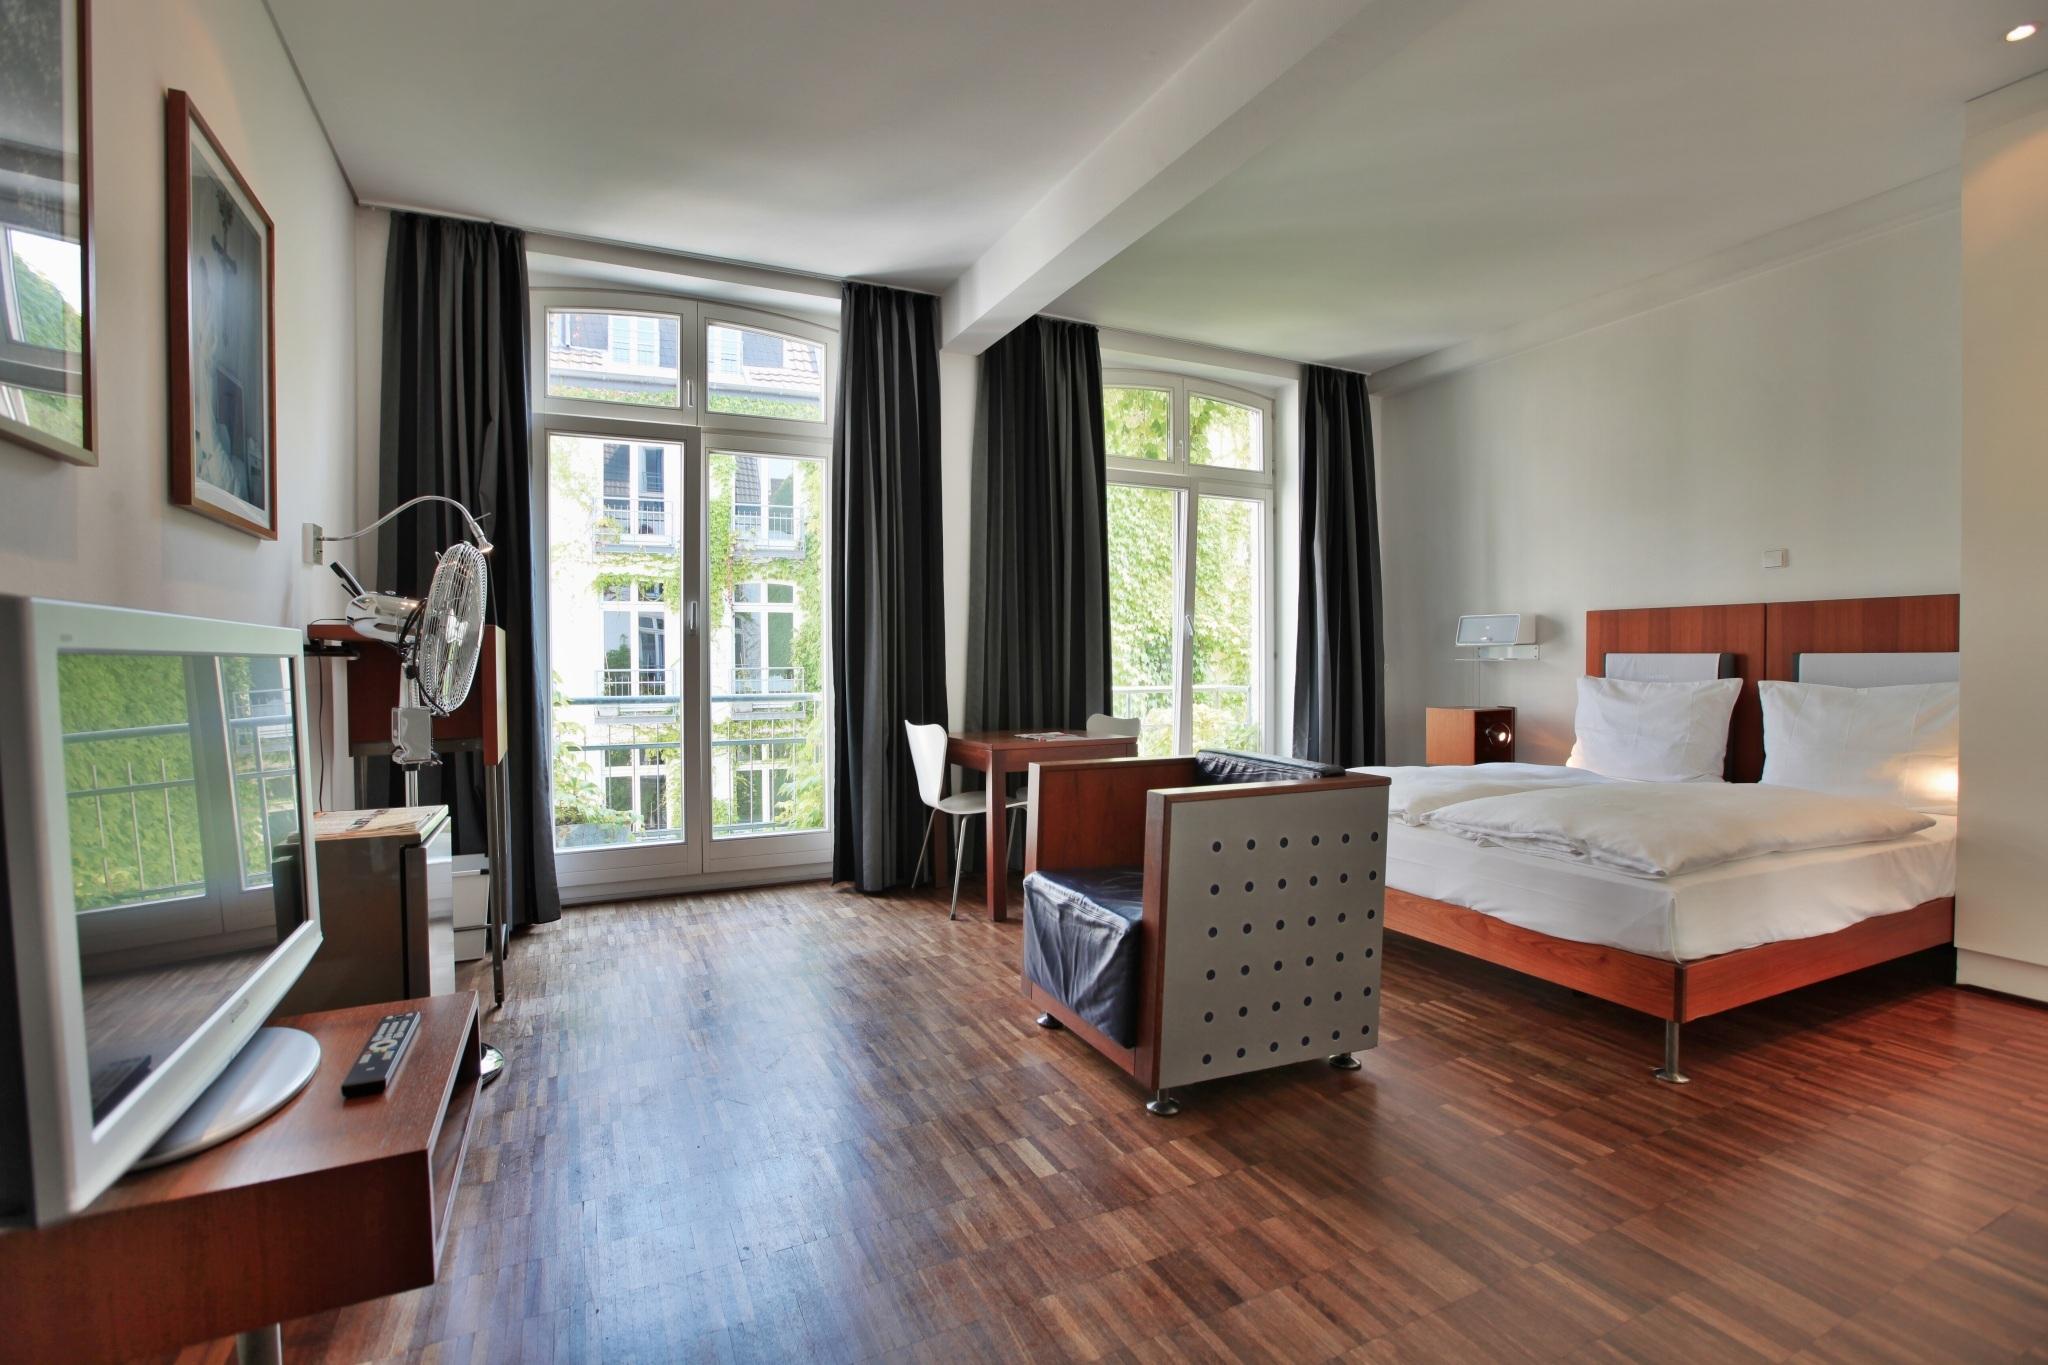 Open Air Am Tanzbrunnen In Koln Hotels In Der Nahe Auf Hotel De